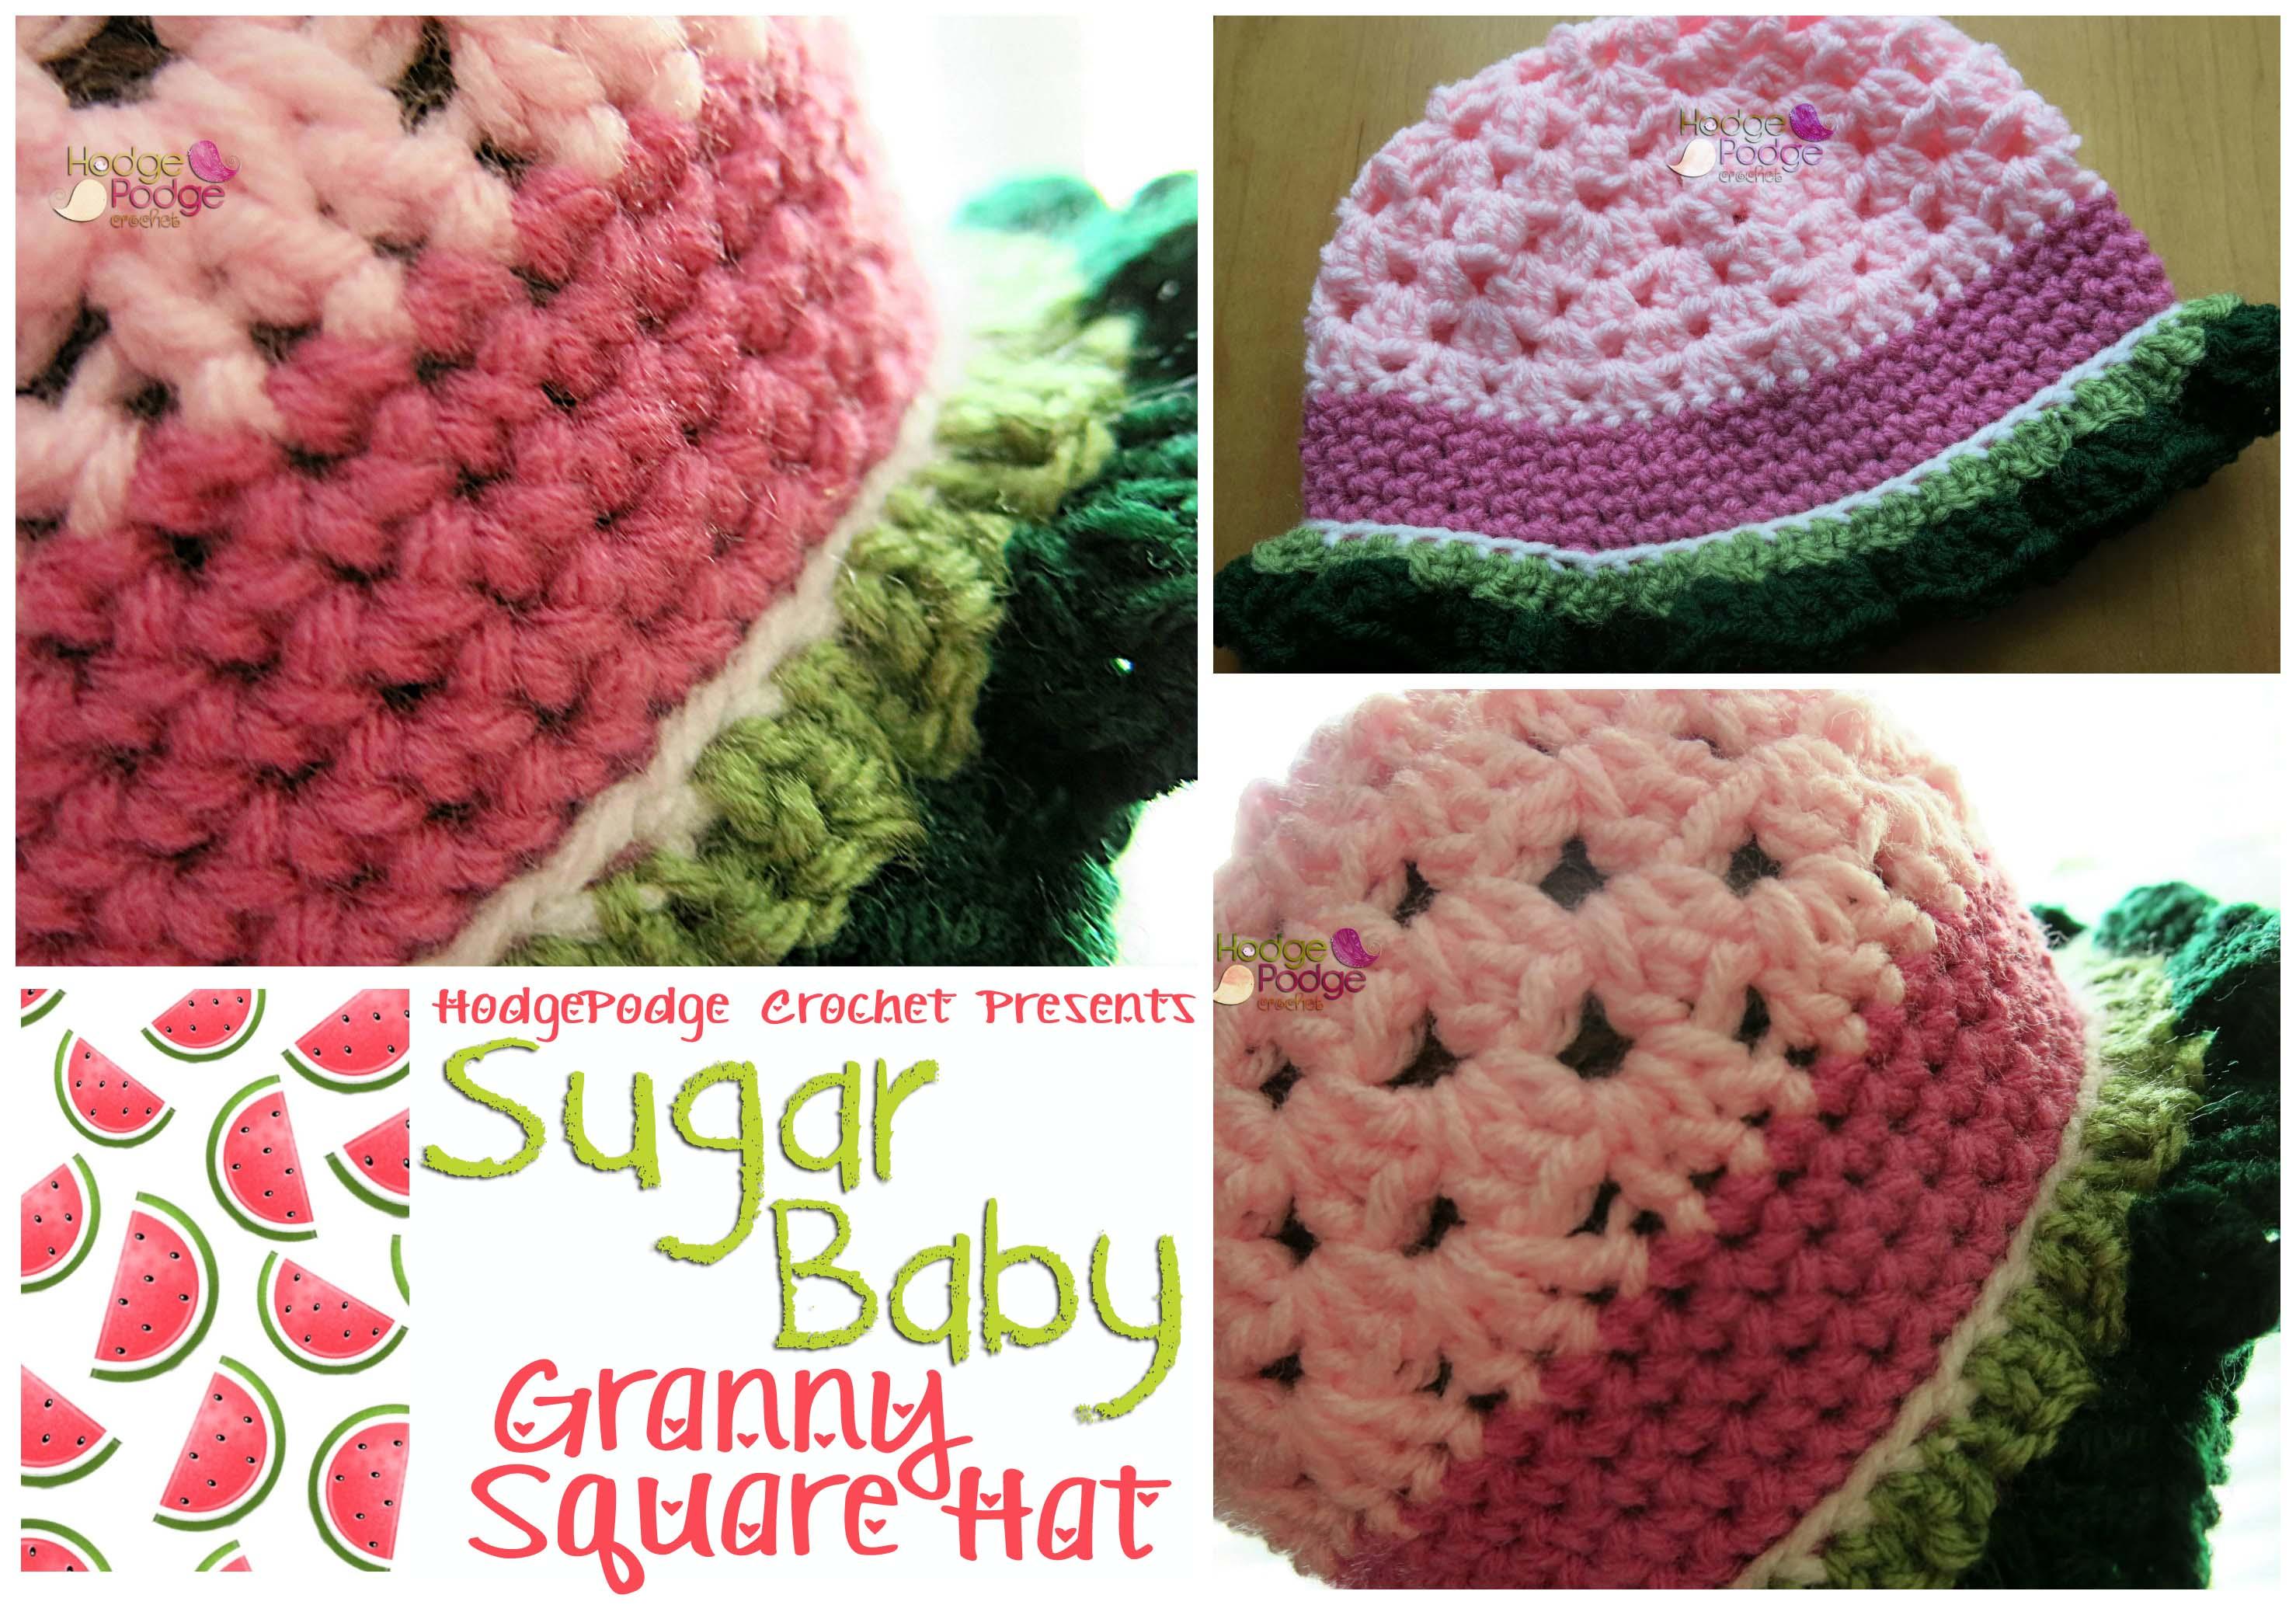 Sugar Baby Granny Square Hat